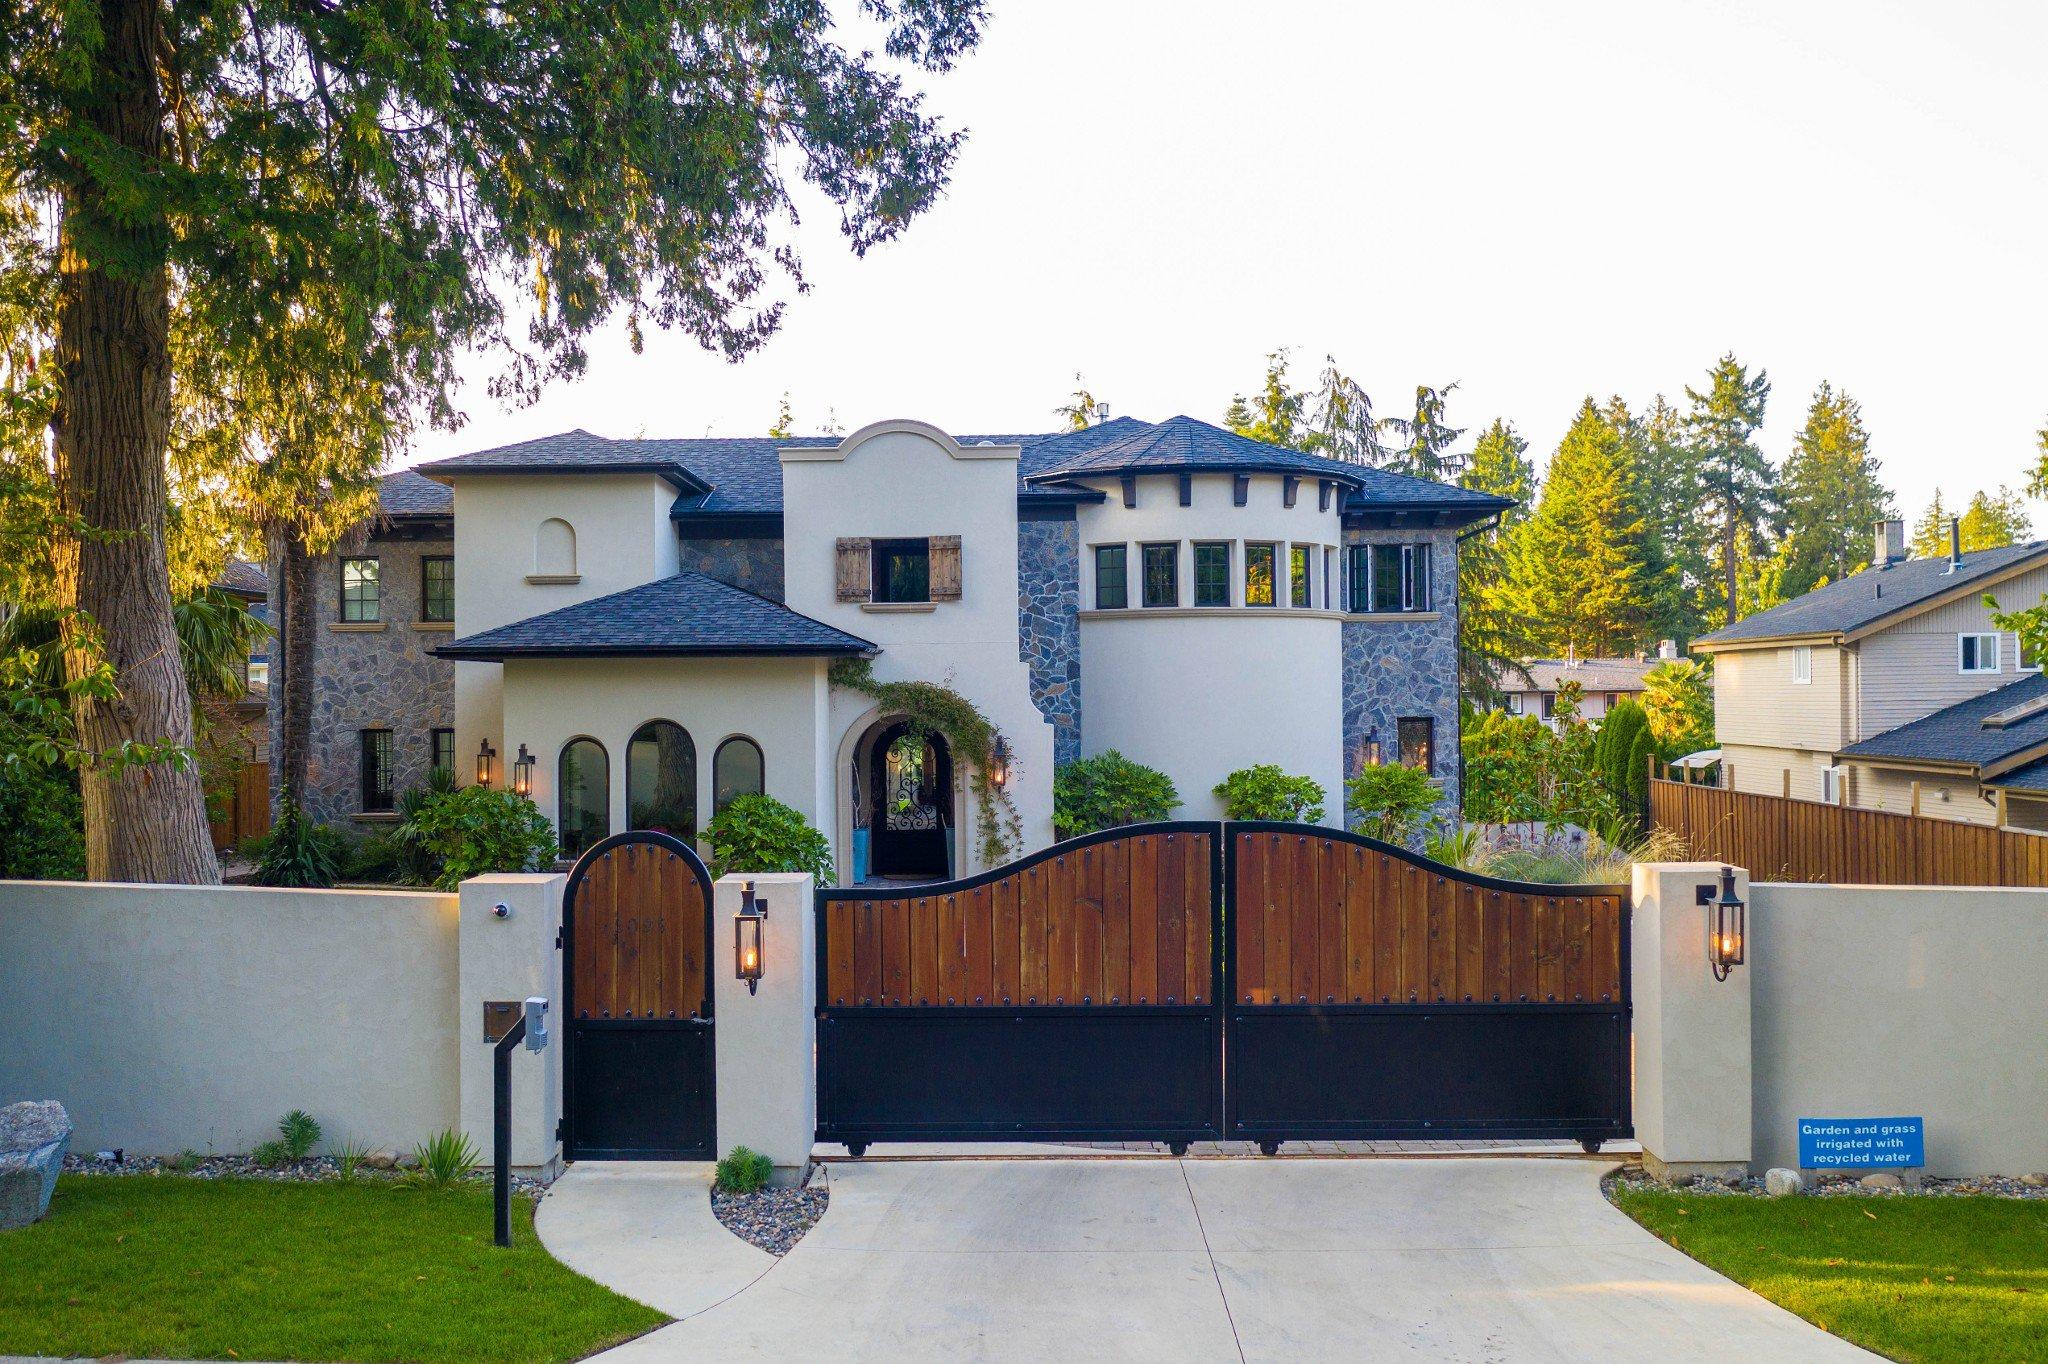 Main Photo: 5095 1 Avenue in Delta: Pebble Hill House for sale (Tsawwassen)  : MLS®# R2396283